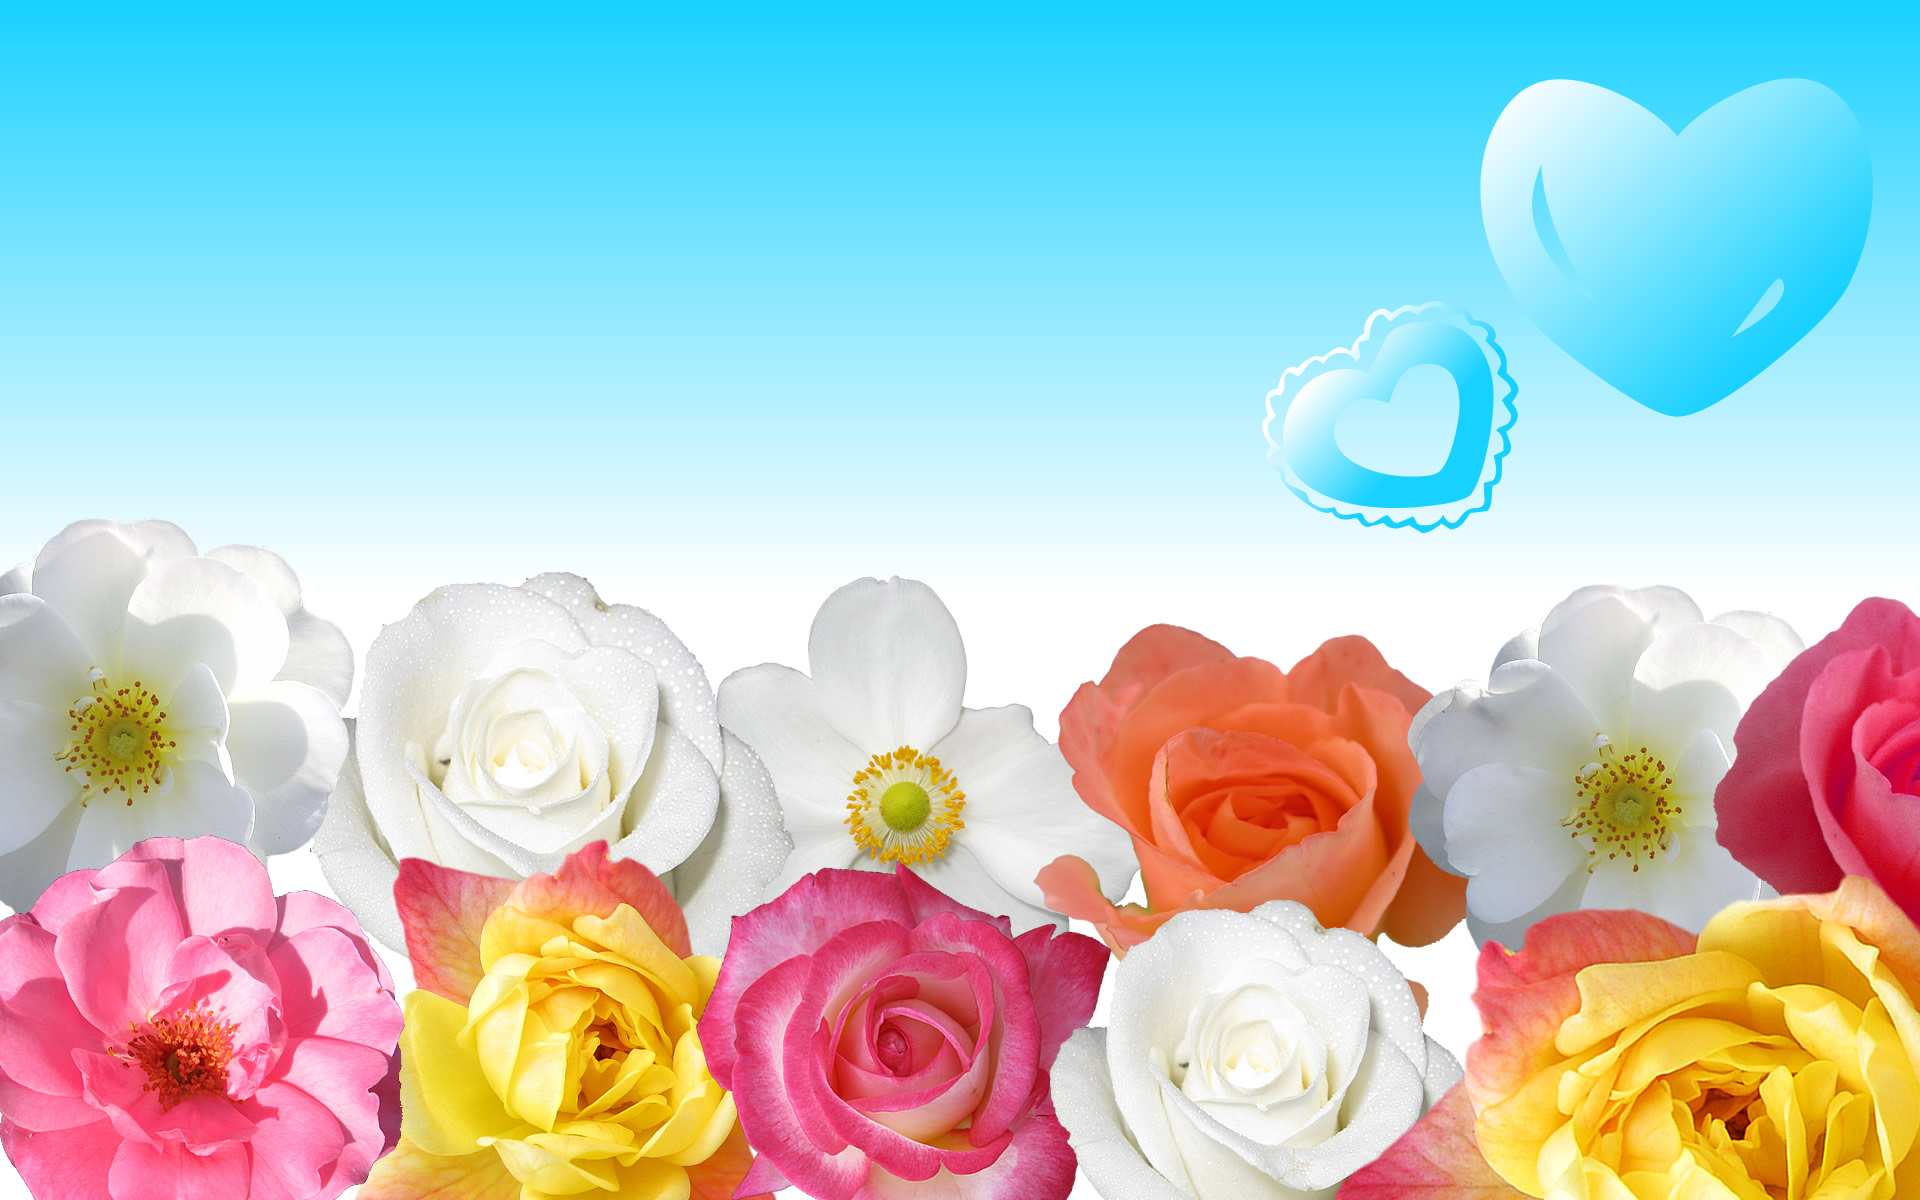 Flowers Wallpaper Download 1219